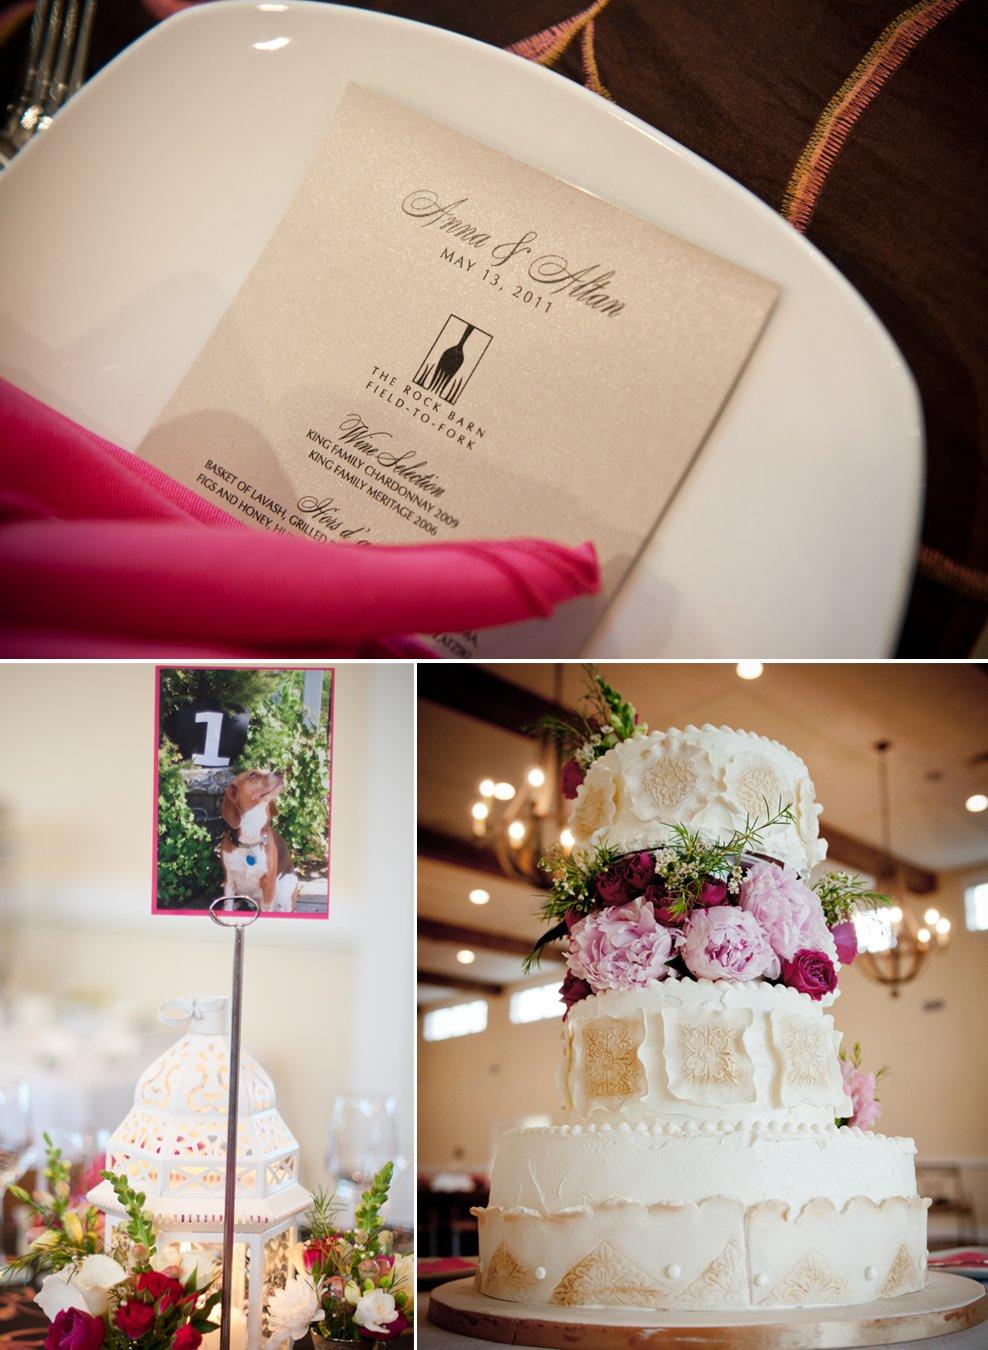 Pink-ivory-real-wedding-elegant-wedding-cake-pink-wedding-flowers.full